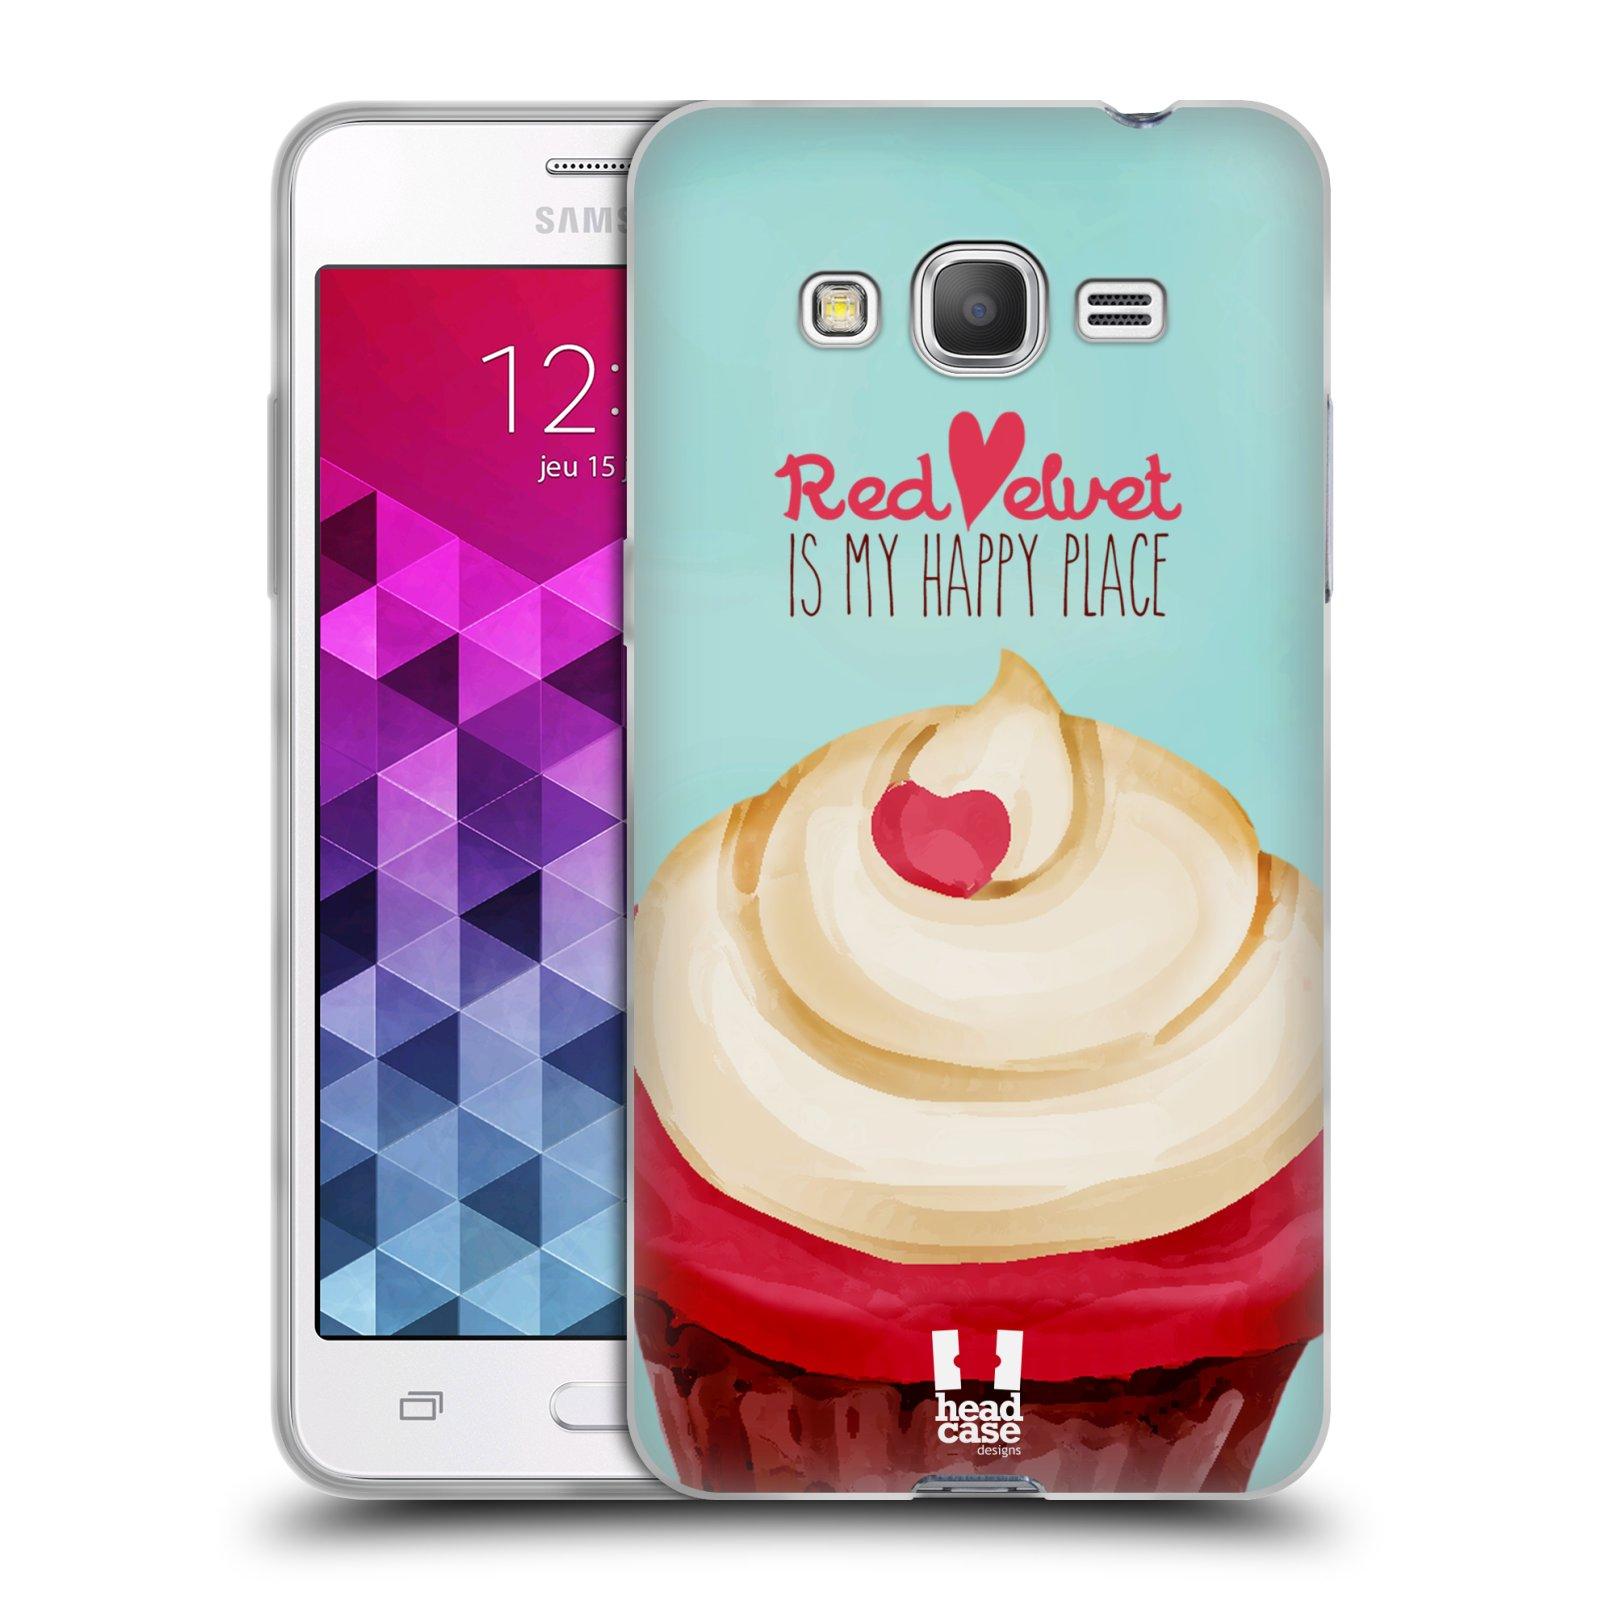 Silikonové pouzdro na mobil Samsung Galaxy Grand Prime VE HEAD CASE CUPCAKE RED VELVET